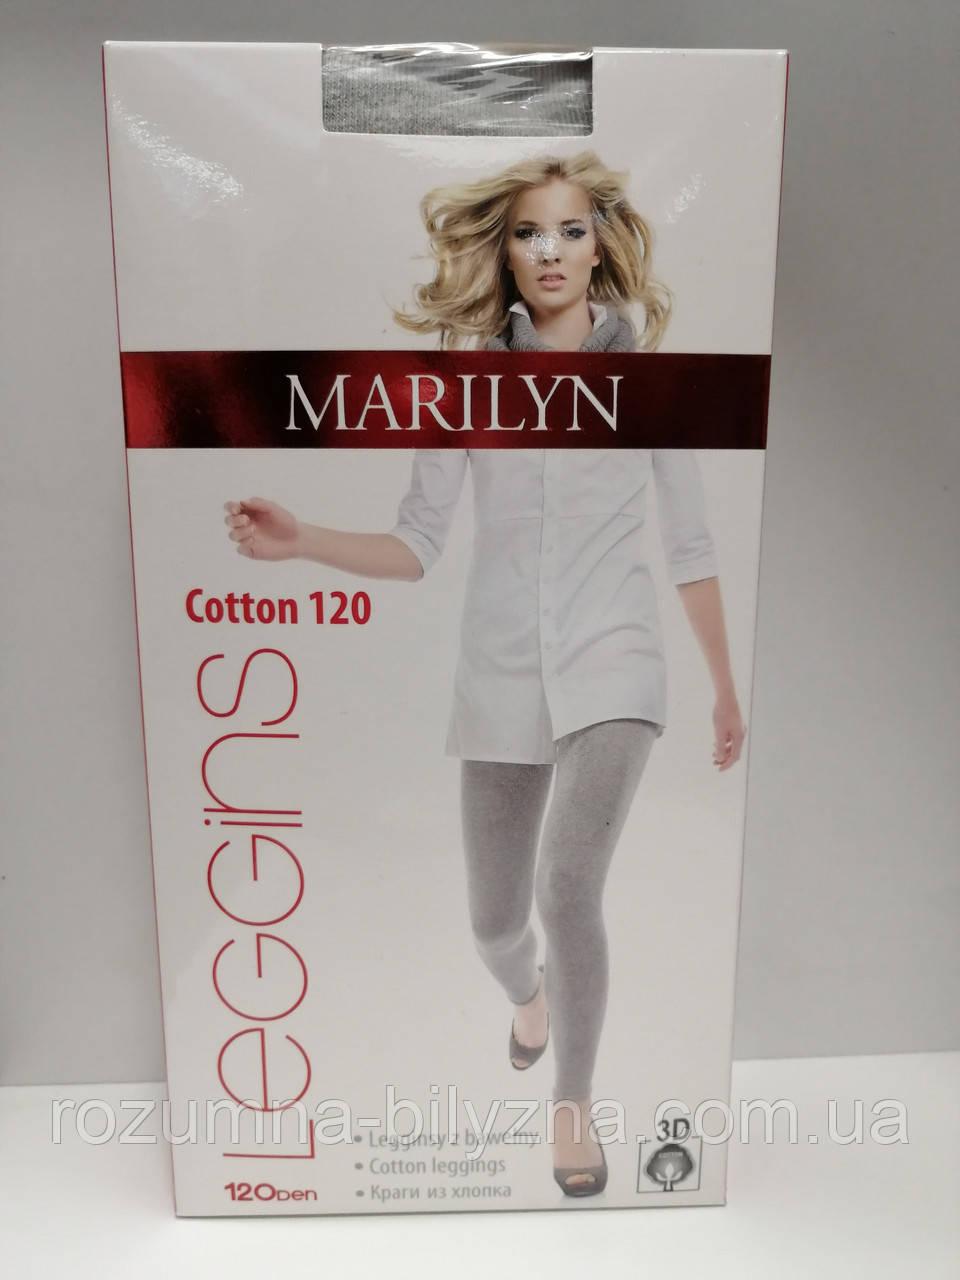 Лосіни жіночі, Cotton 120, light melange. TM Marilyne.  Польща. 1/2,3/4